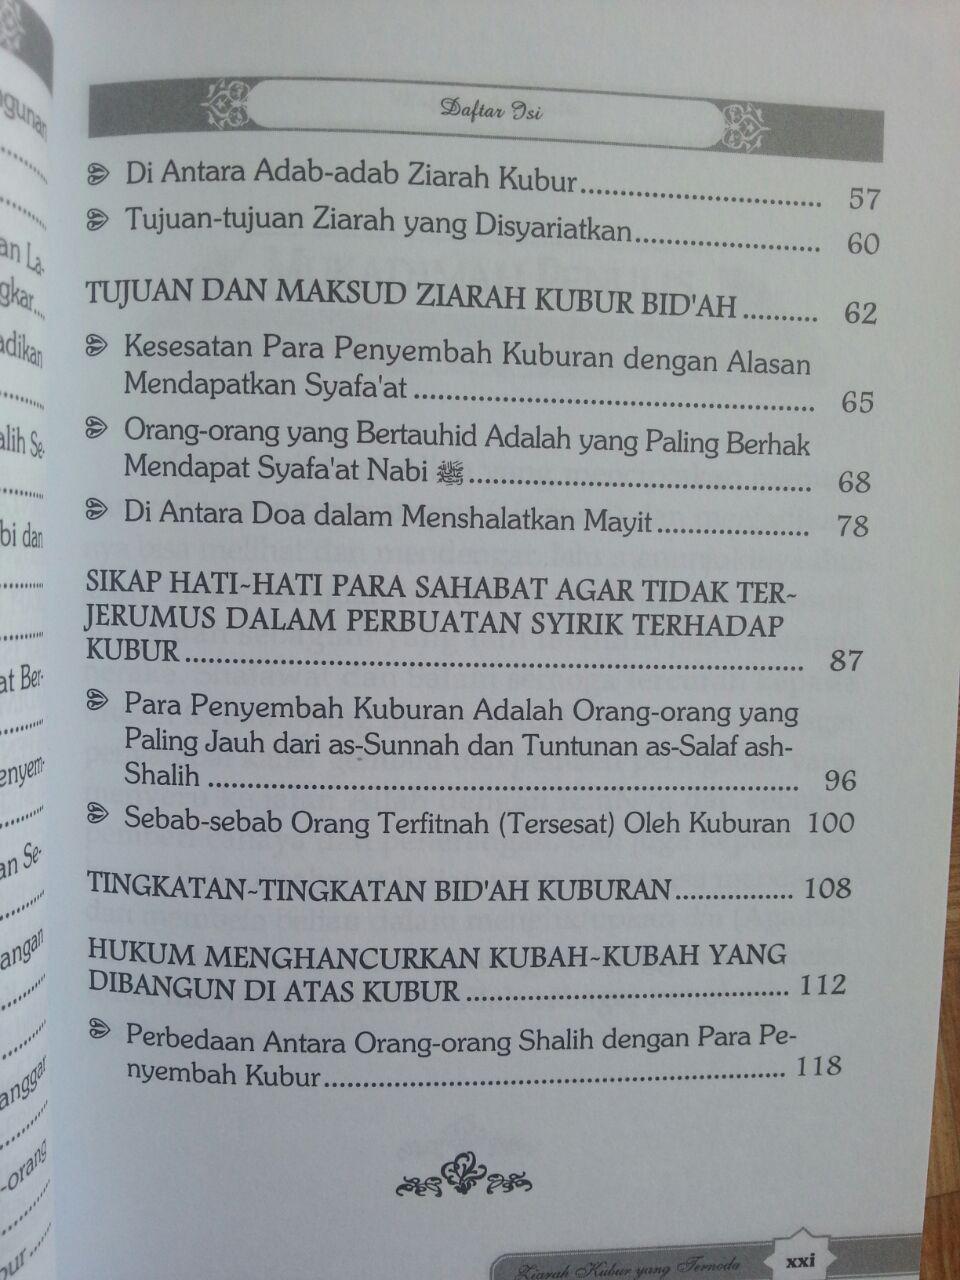 Buku Ziarah Kubur Yang Ternoda isi 2